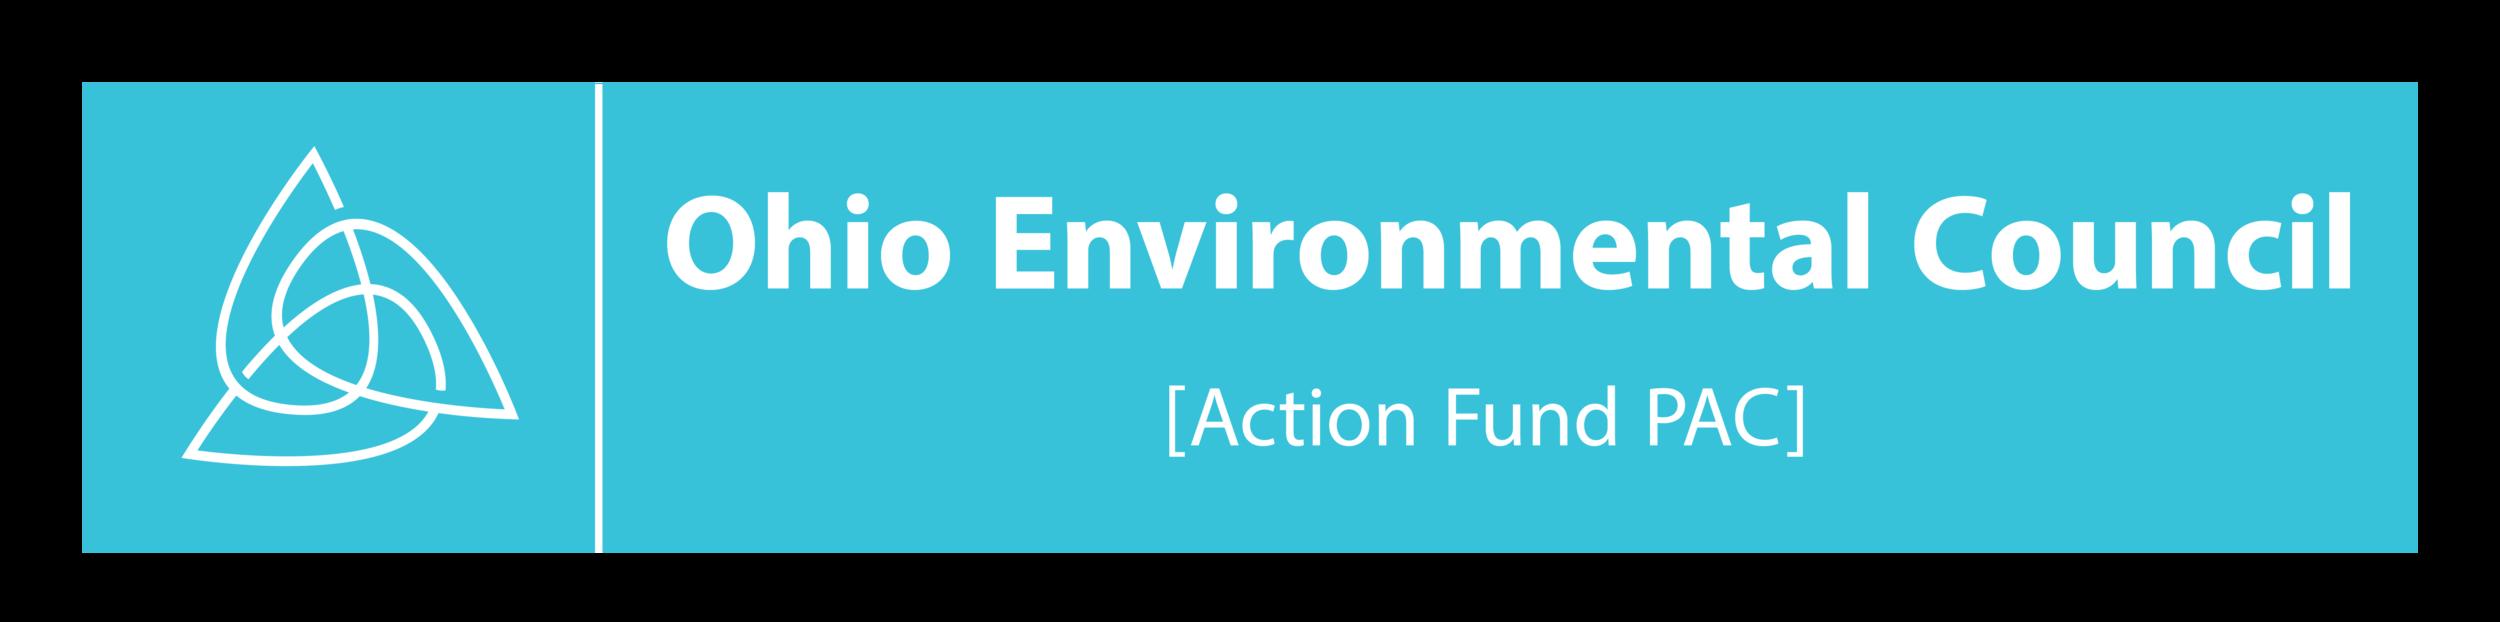 Ohio Environmental Council PAC_logo.png